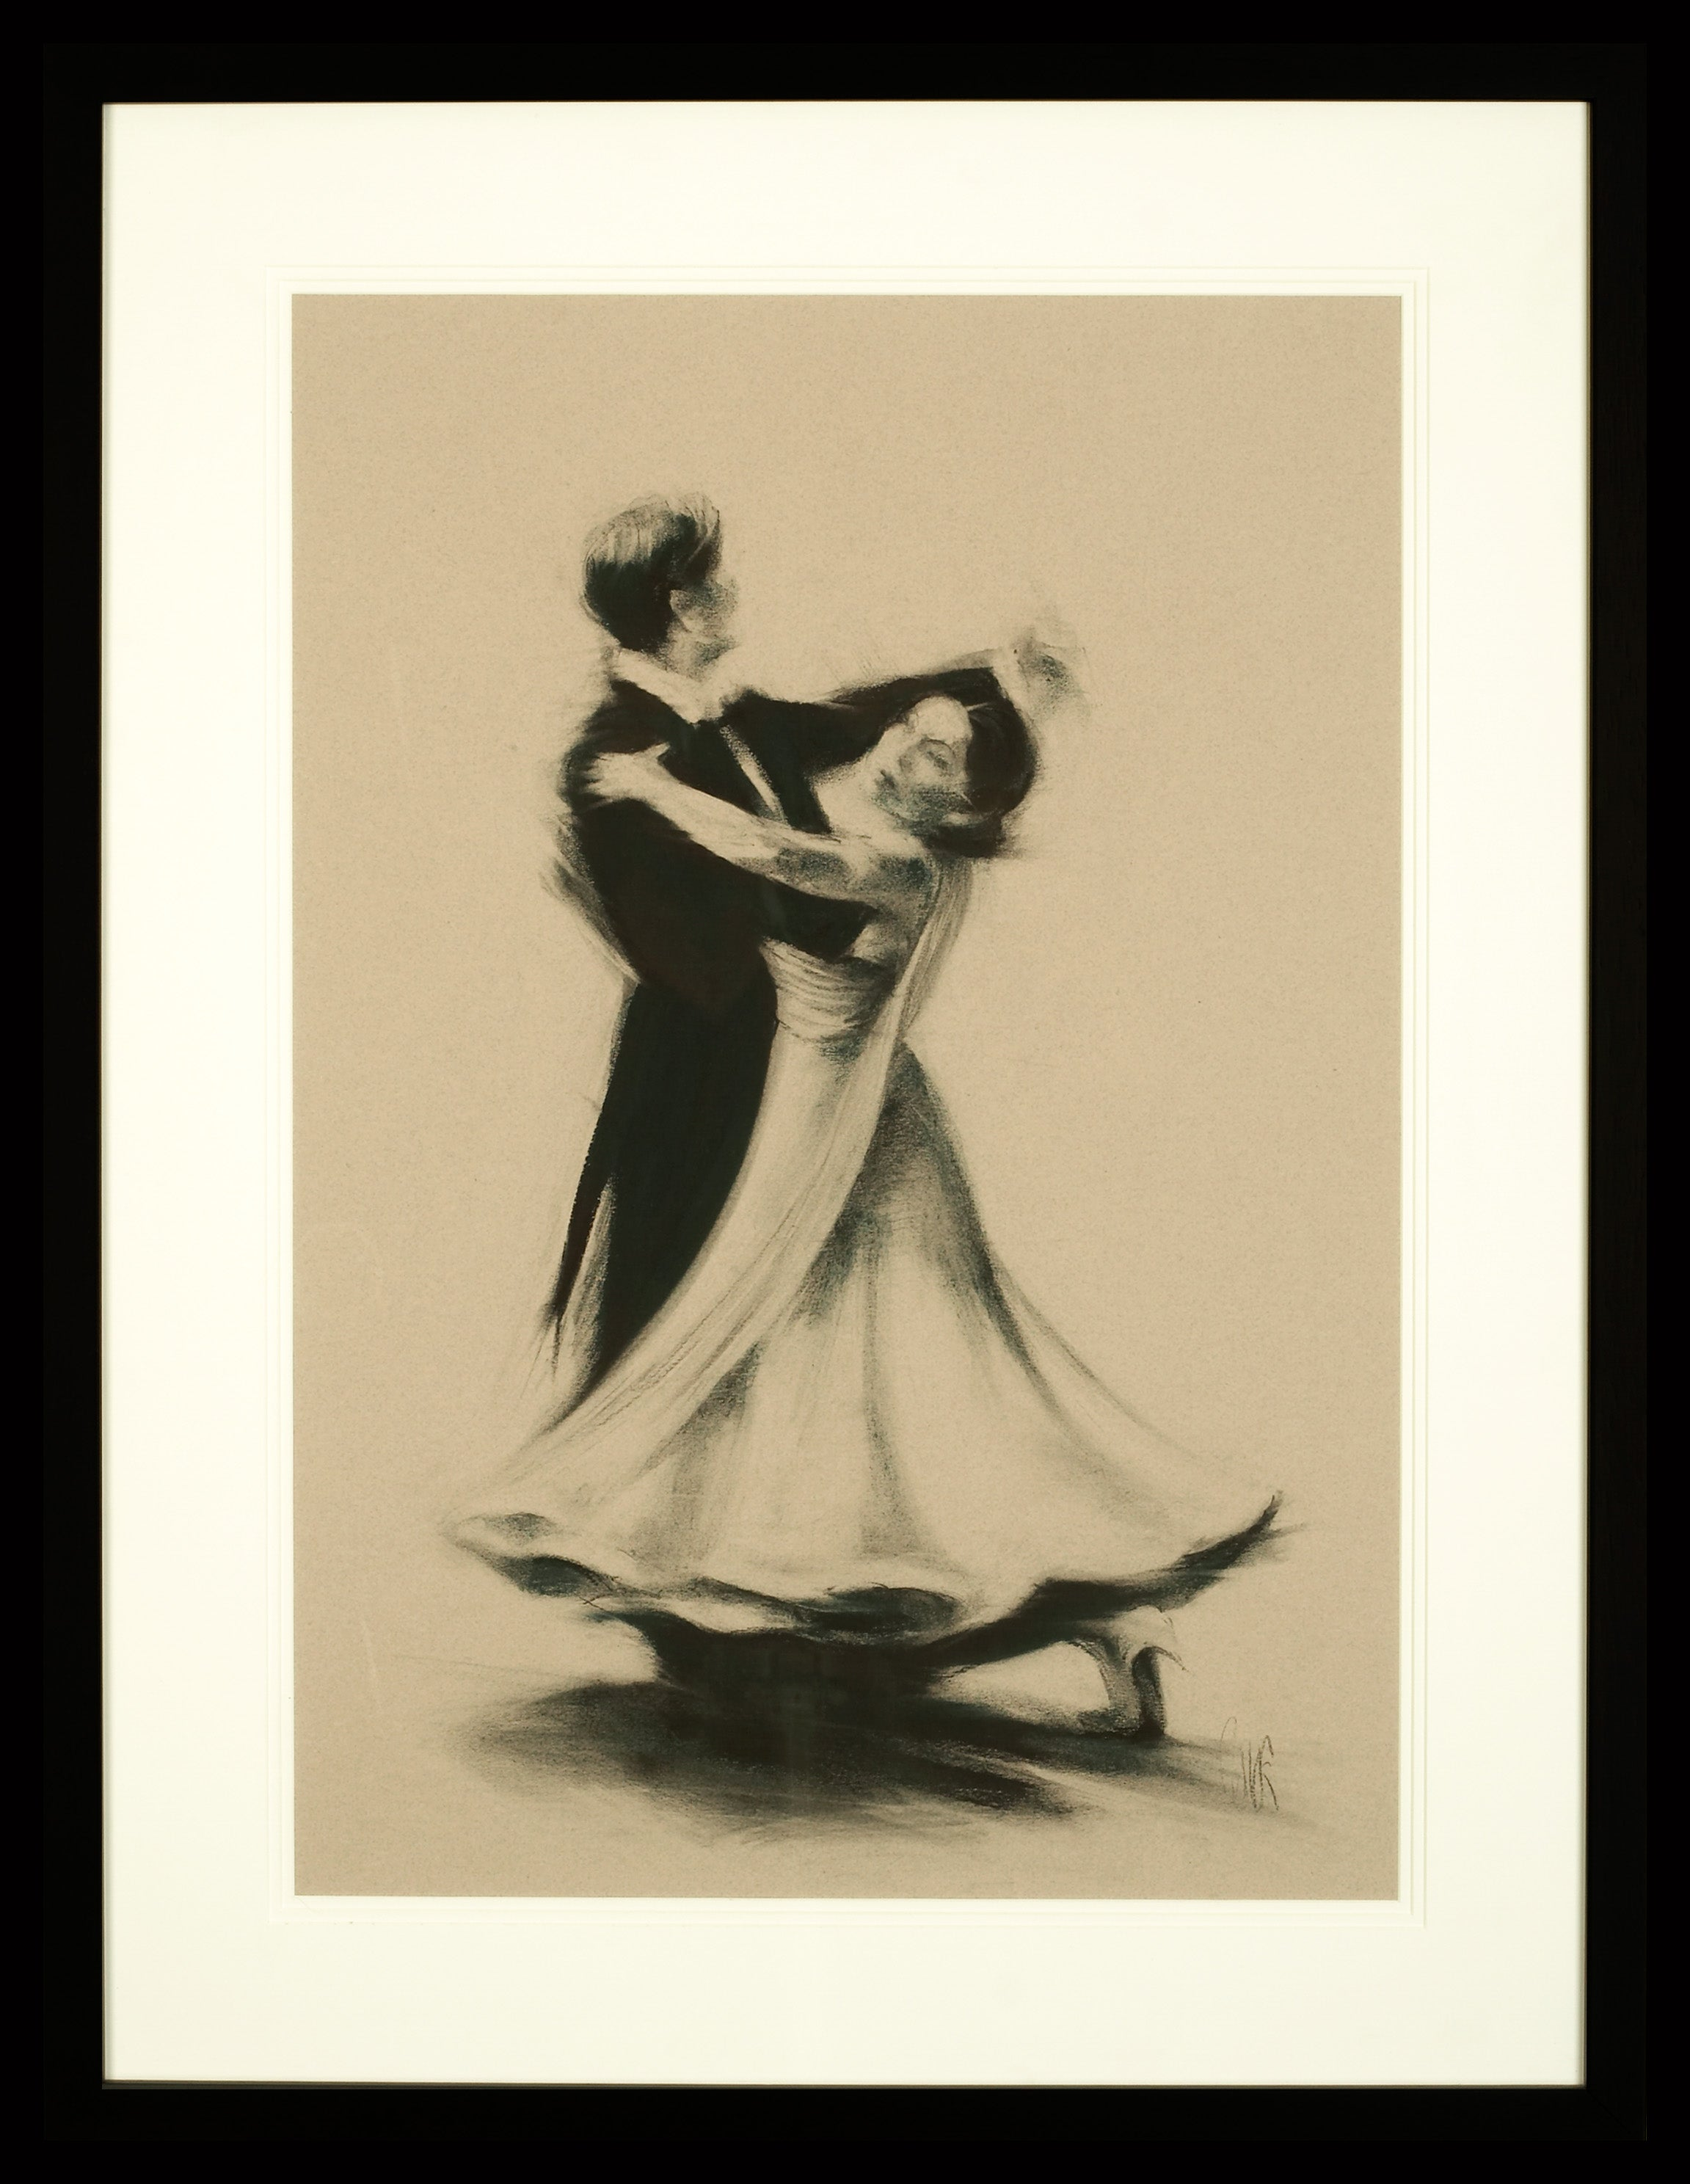 Ballroom Dancers - Charcoal, Figurative, Fabric, Movement, Human Form, British